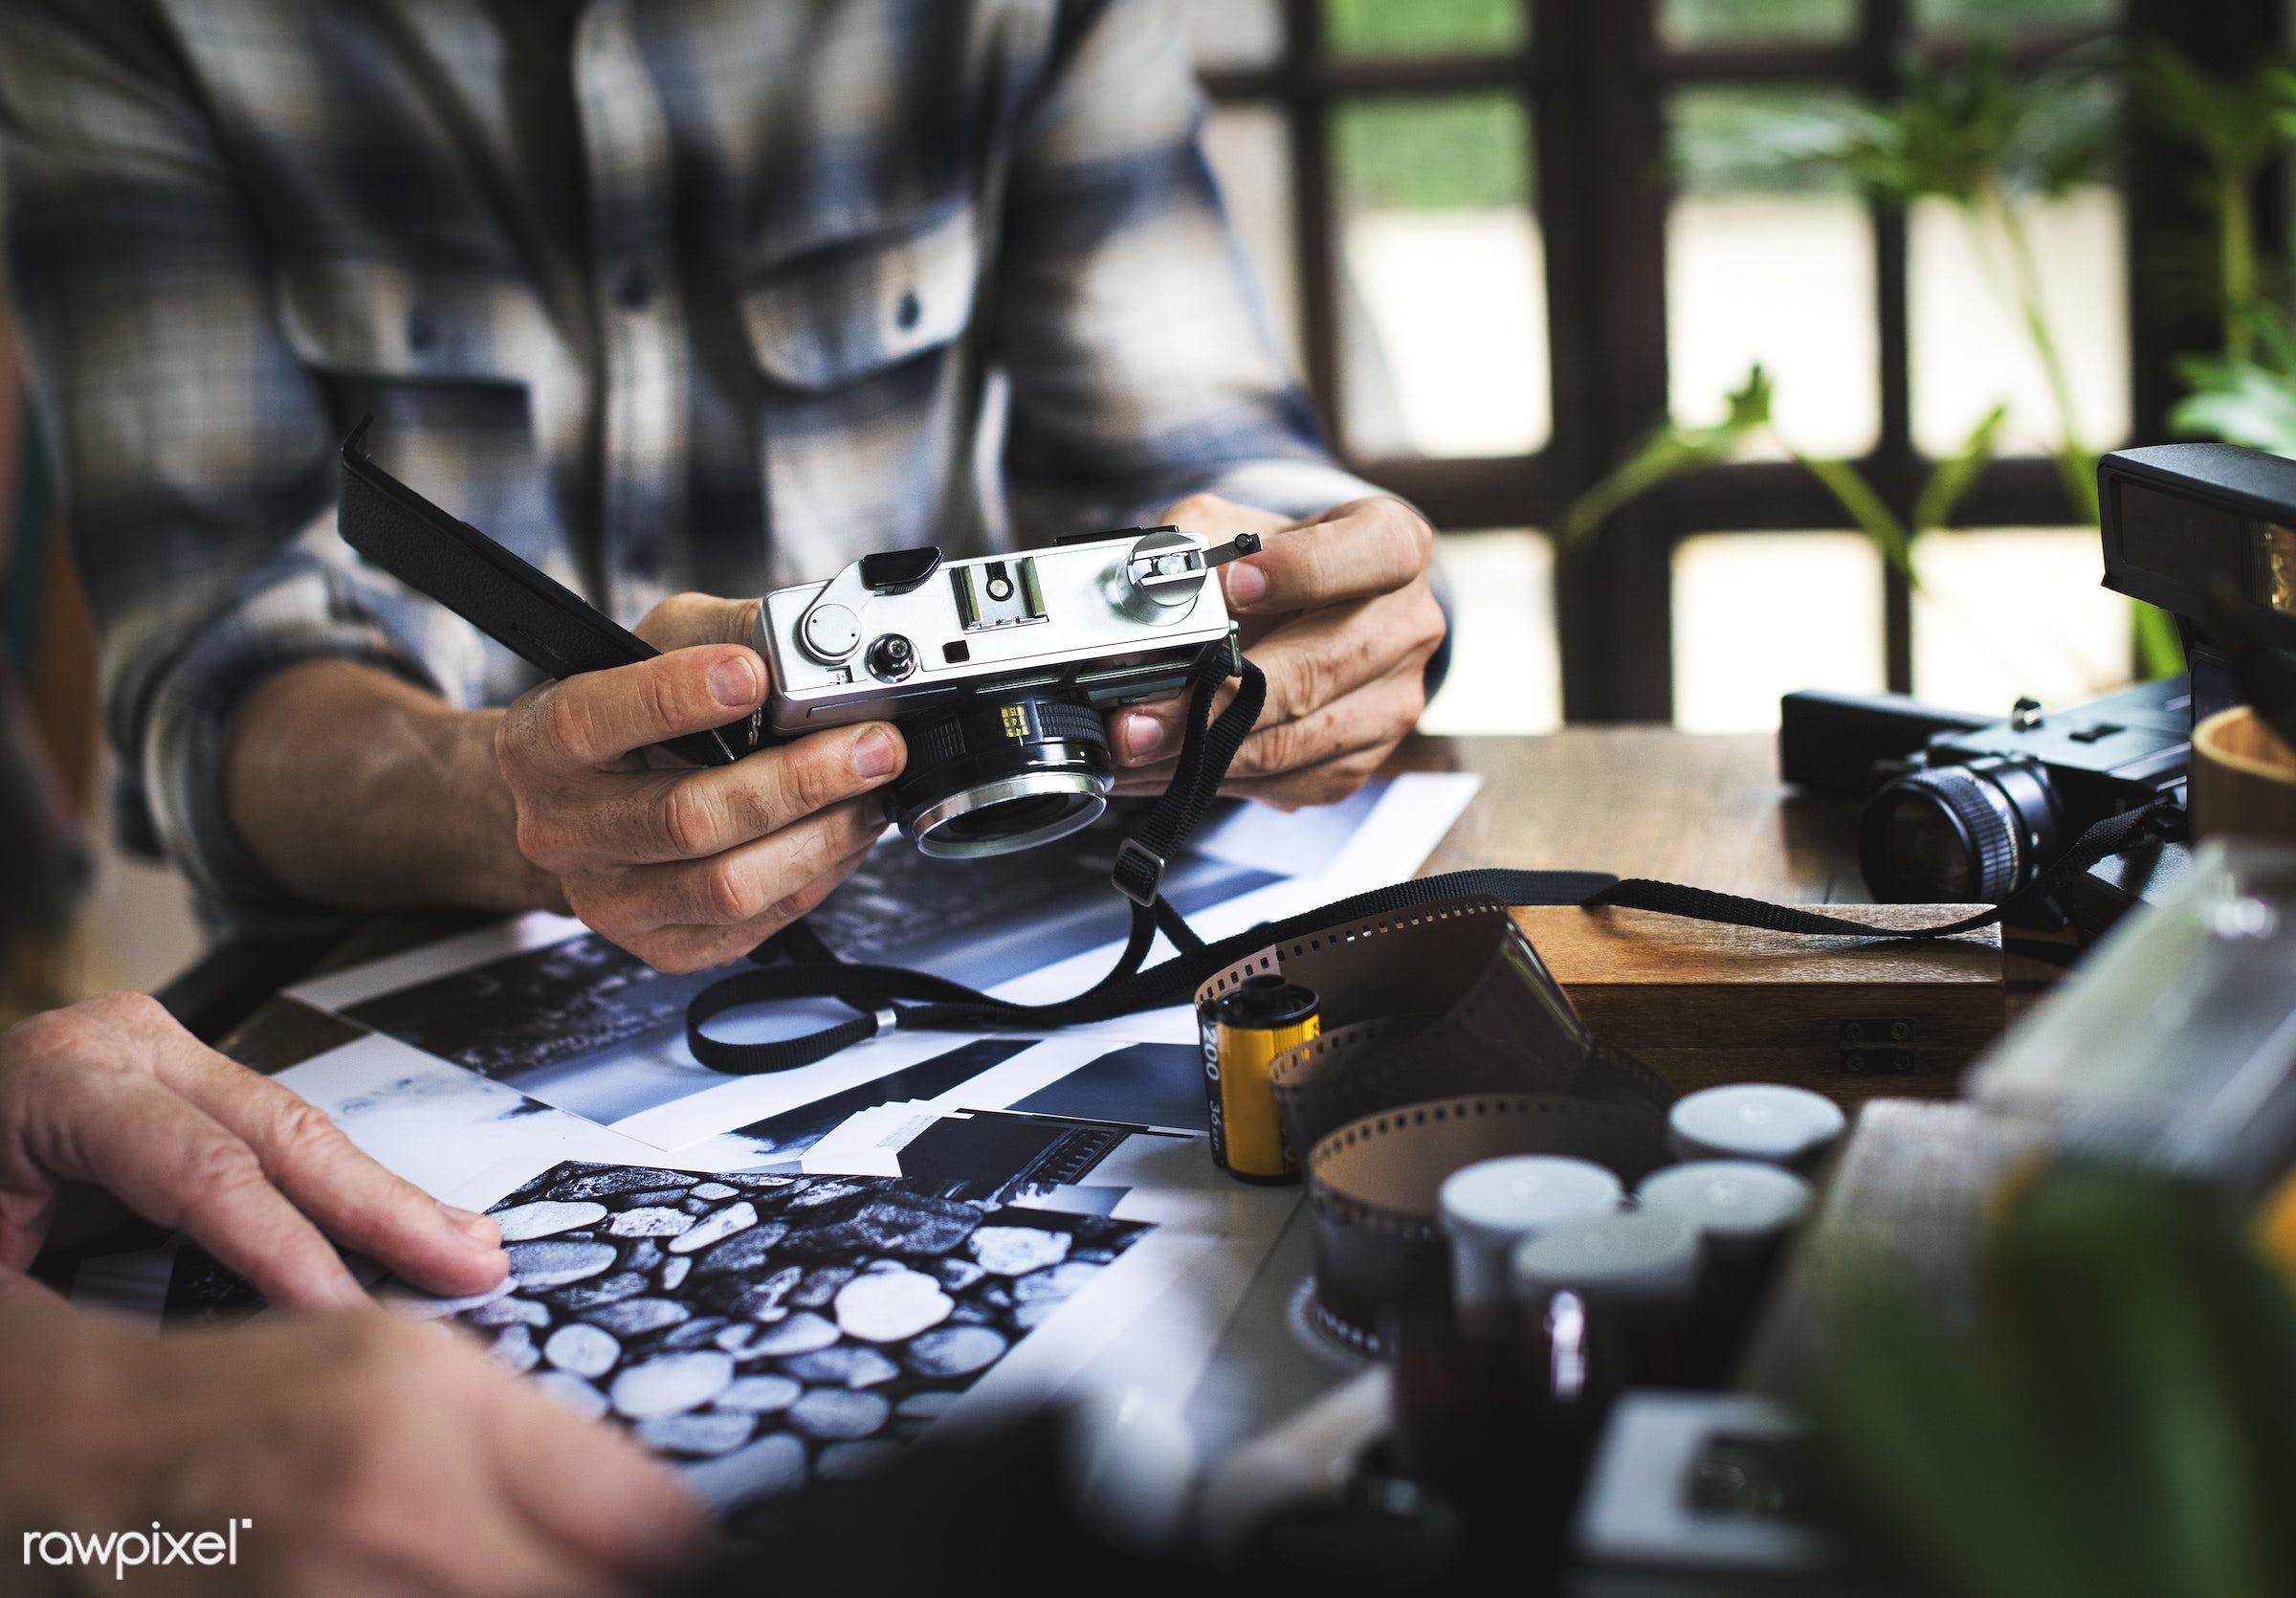 film, vintage, camera, hobby, retro, leisure, photography, hands, photographer, activity, classic, closeup, man